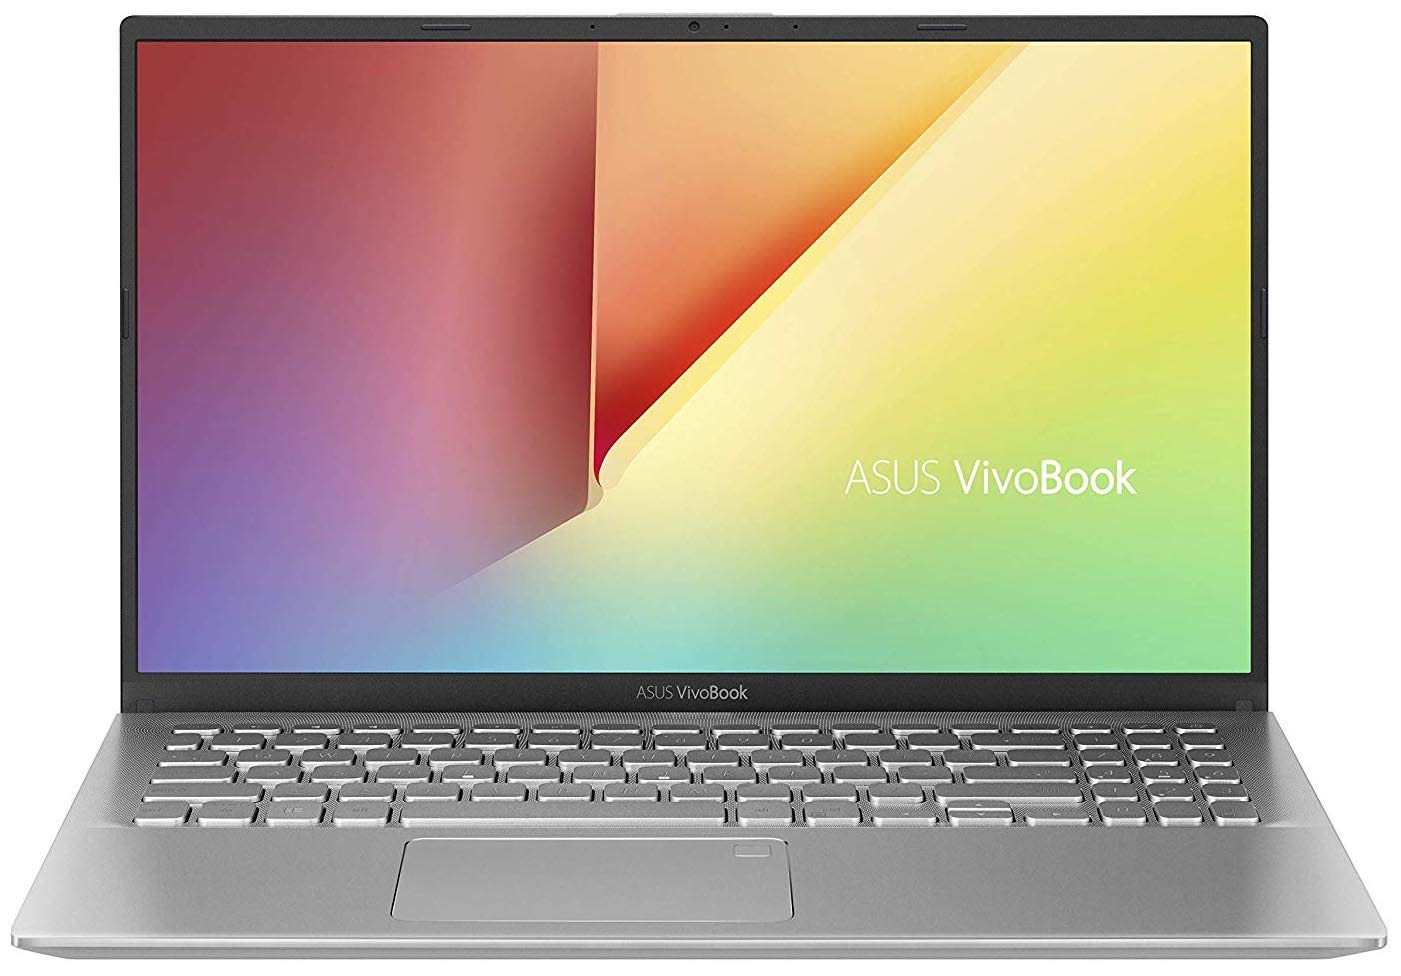 8 Best Laptop Under 70000 In India 2020 asus-vivo-book-15-10-1024x1024.jpg